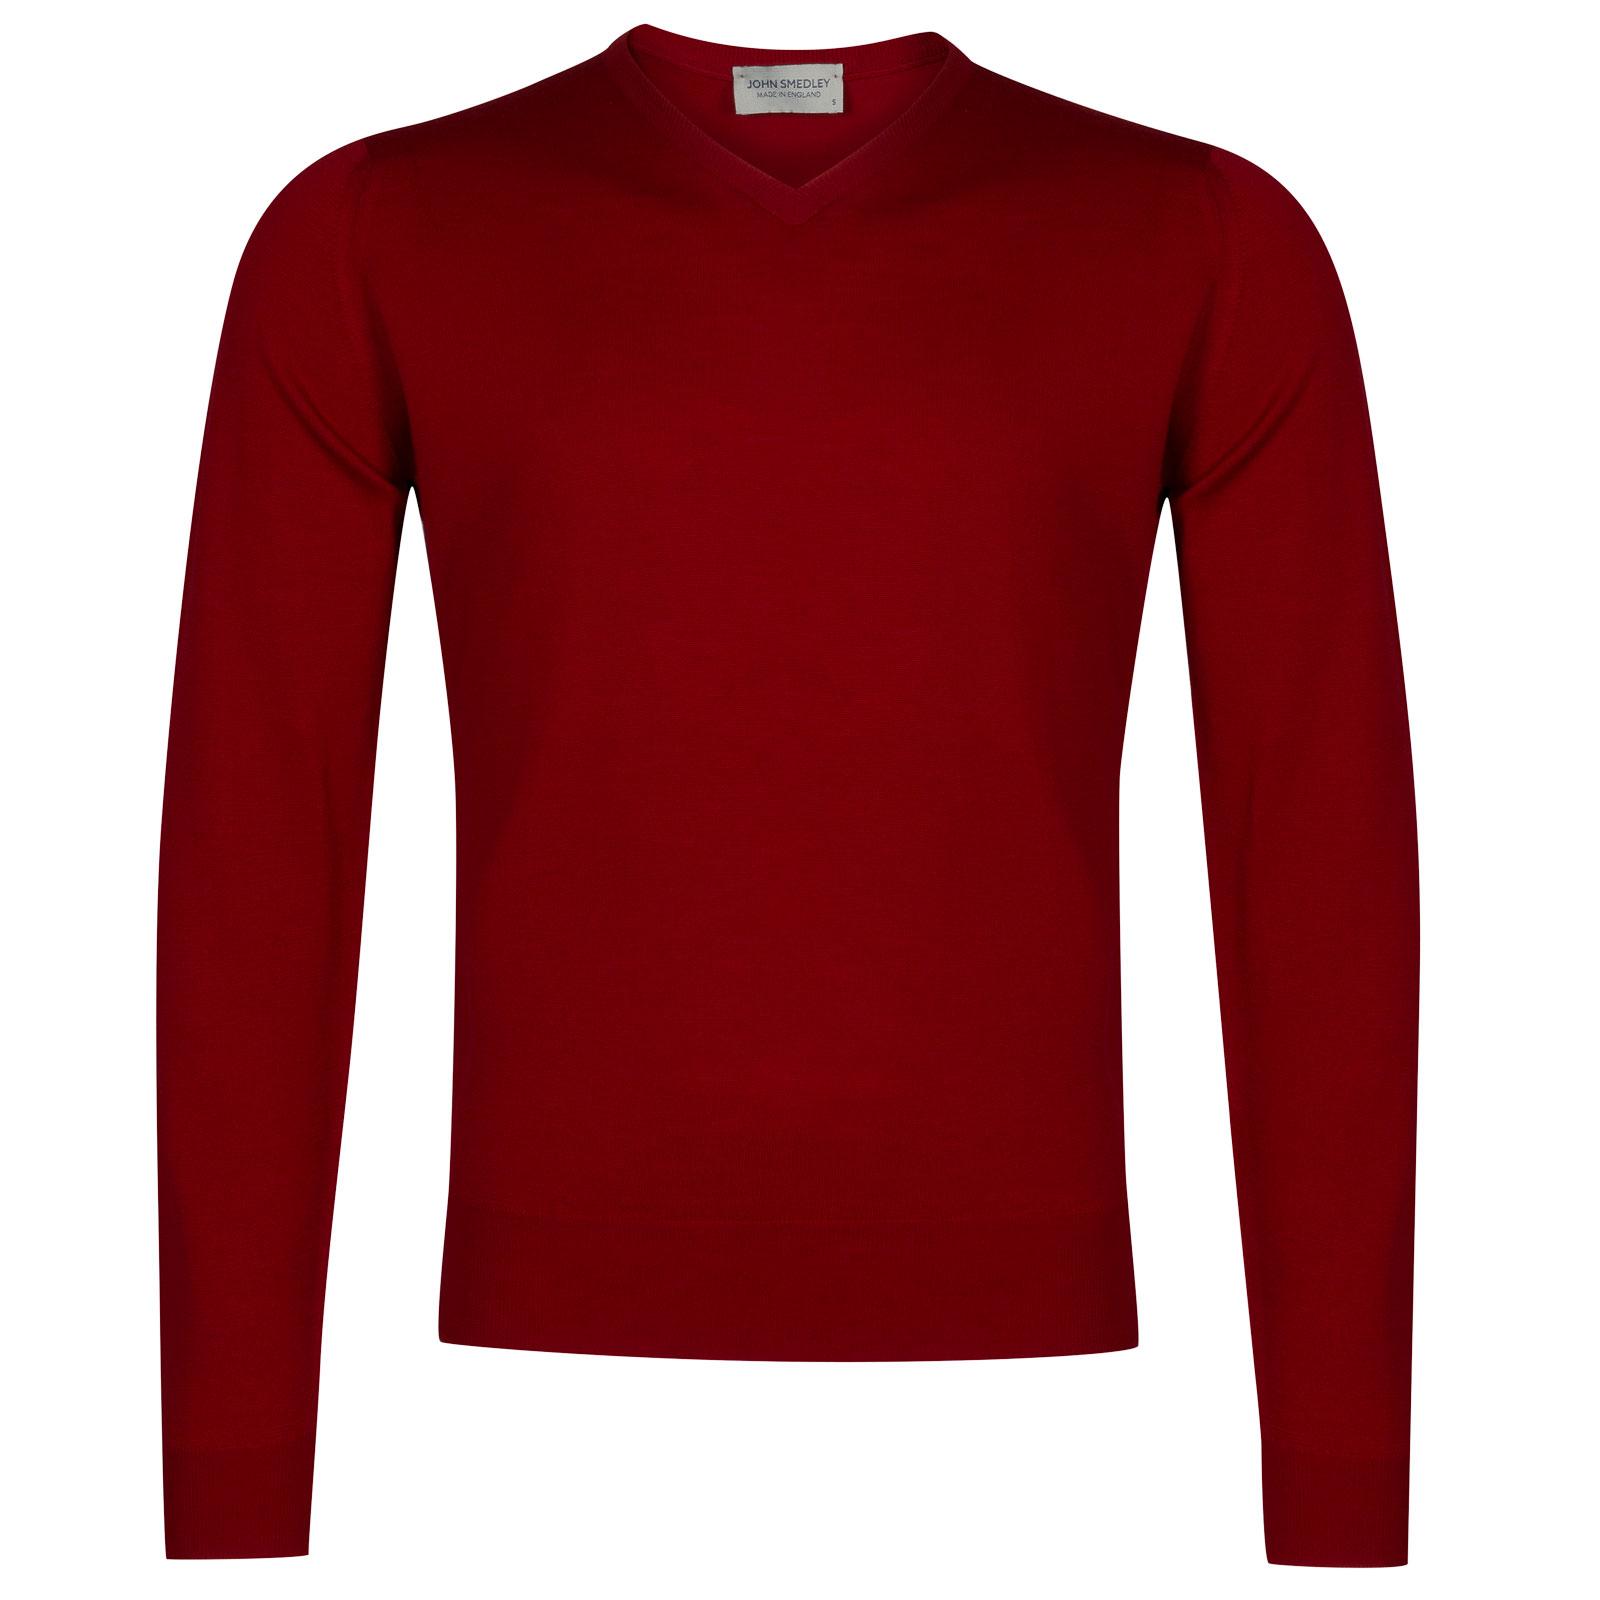 John Smedley genoa Merino Wool Pullover in Crimson Forest-S